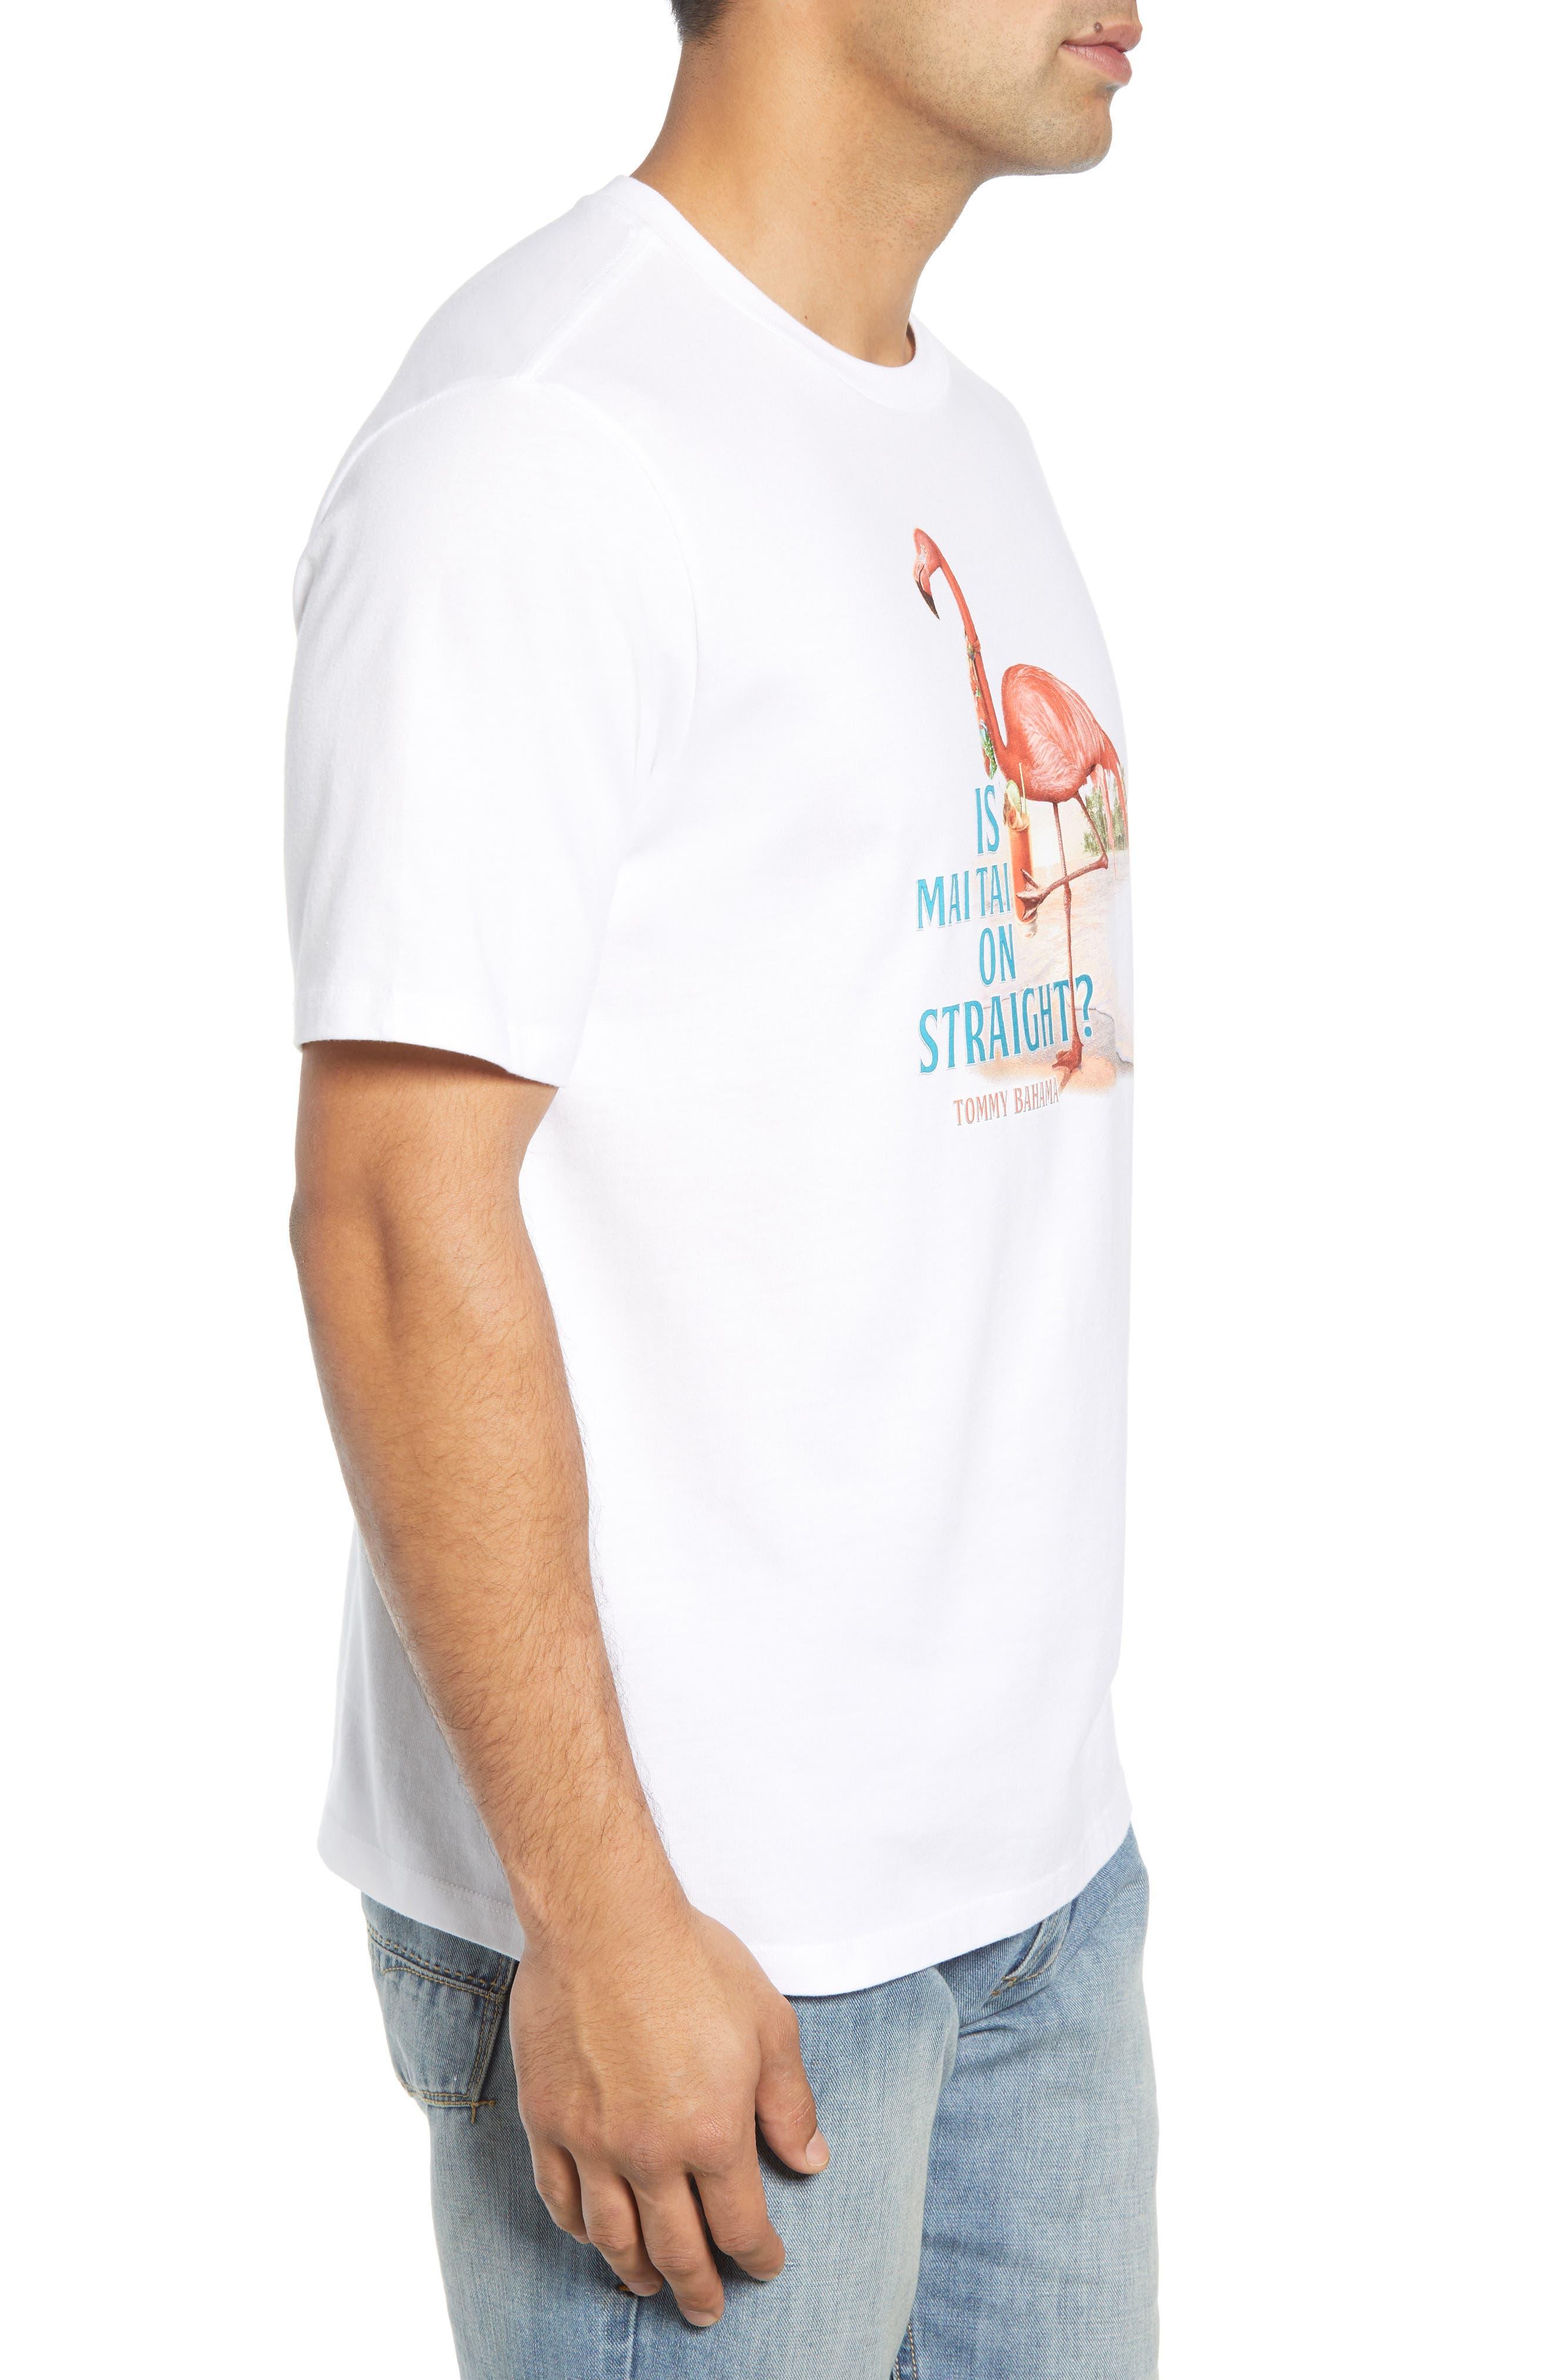 Is Mai Tai on Straight? T-Shirt,                             Alternate thumbnail 3, color,                             WHITE